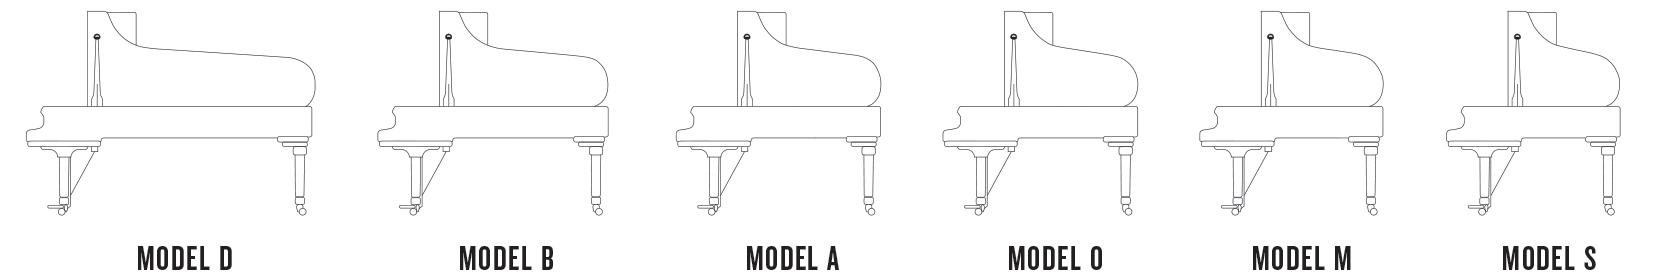 Steinway Grand Piano | Steinway & Sons - Steinway & Sons